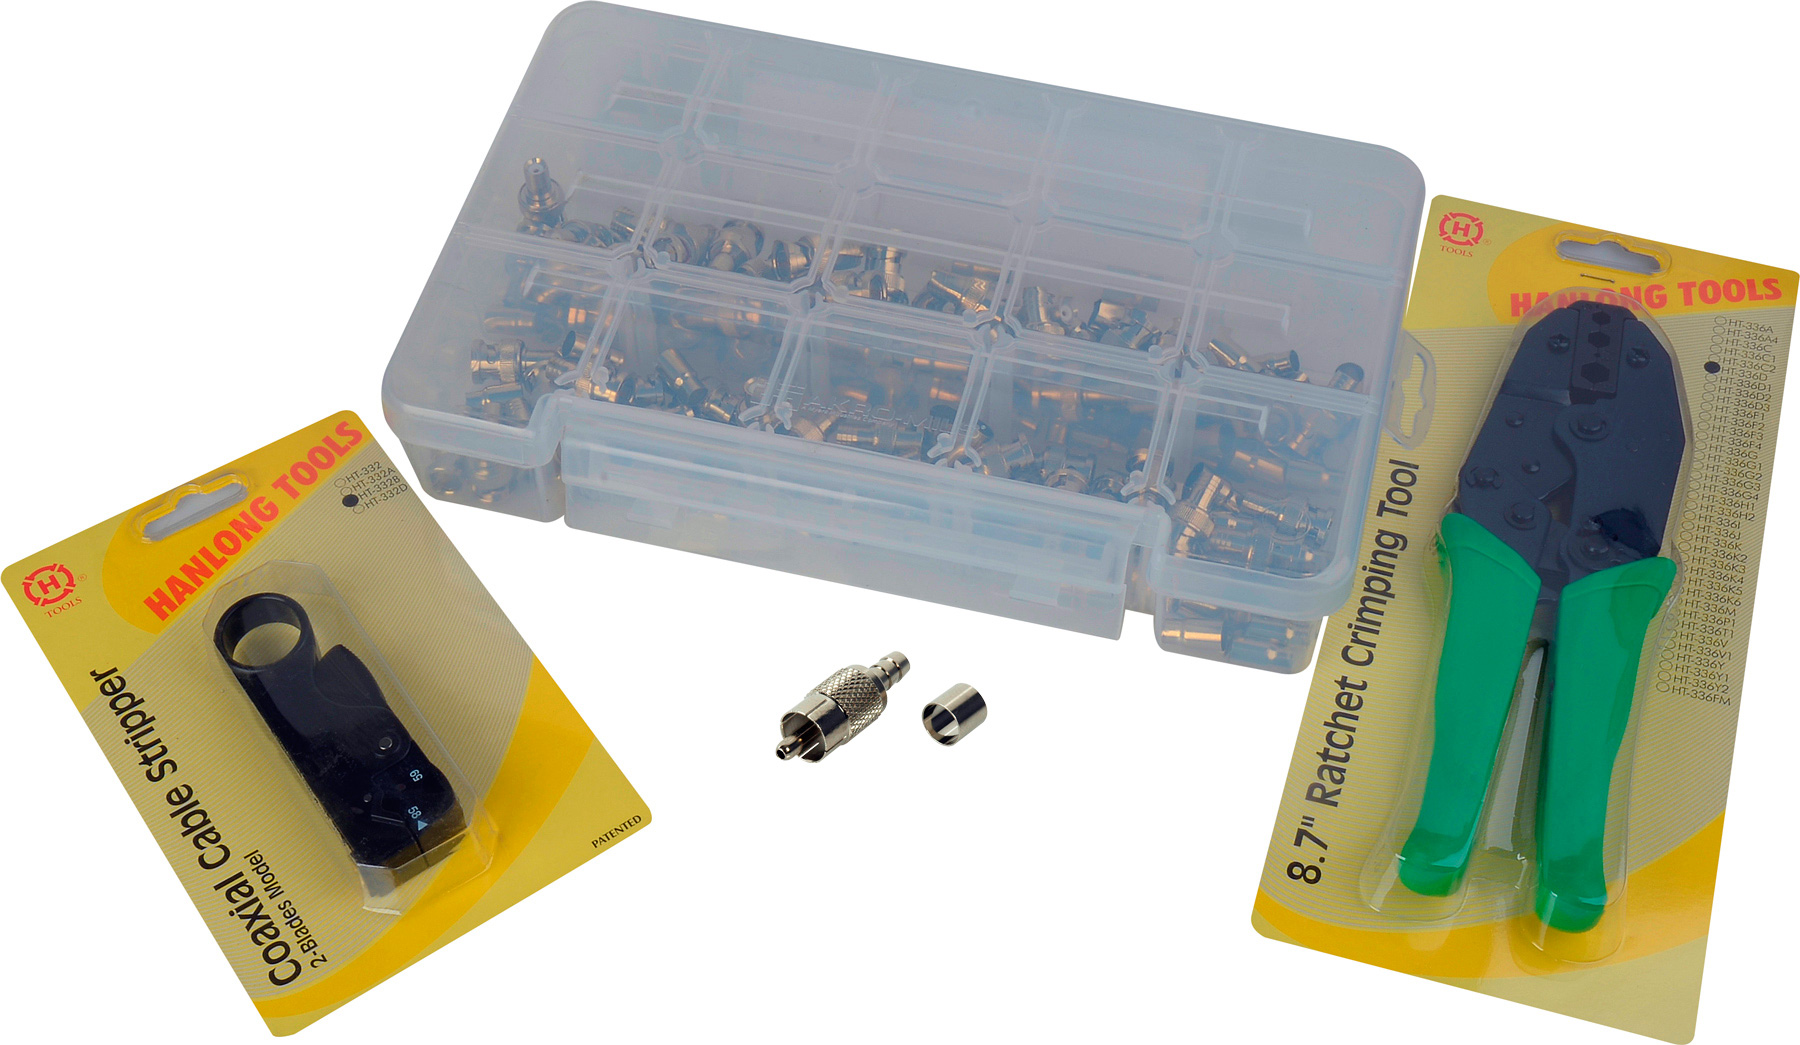 Adapter & Connector Kits